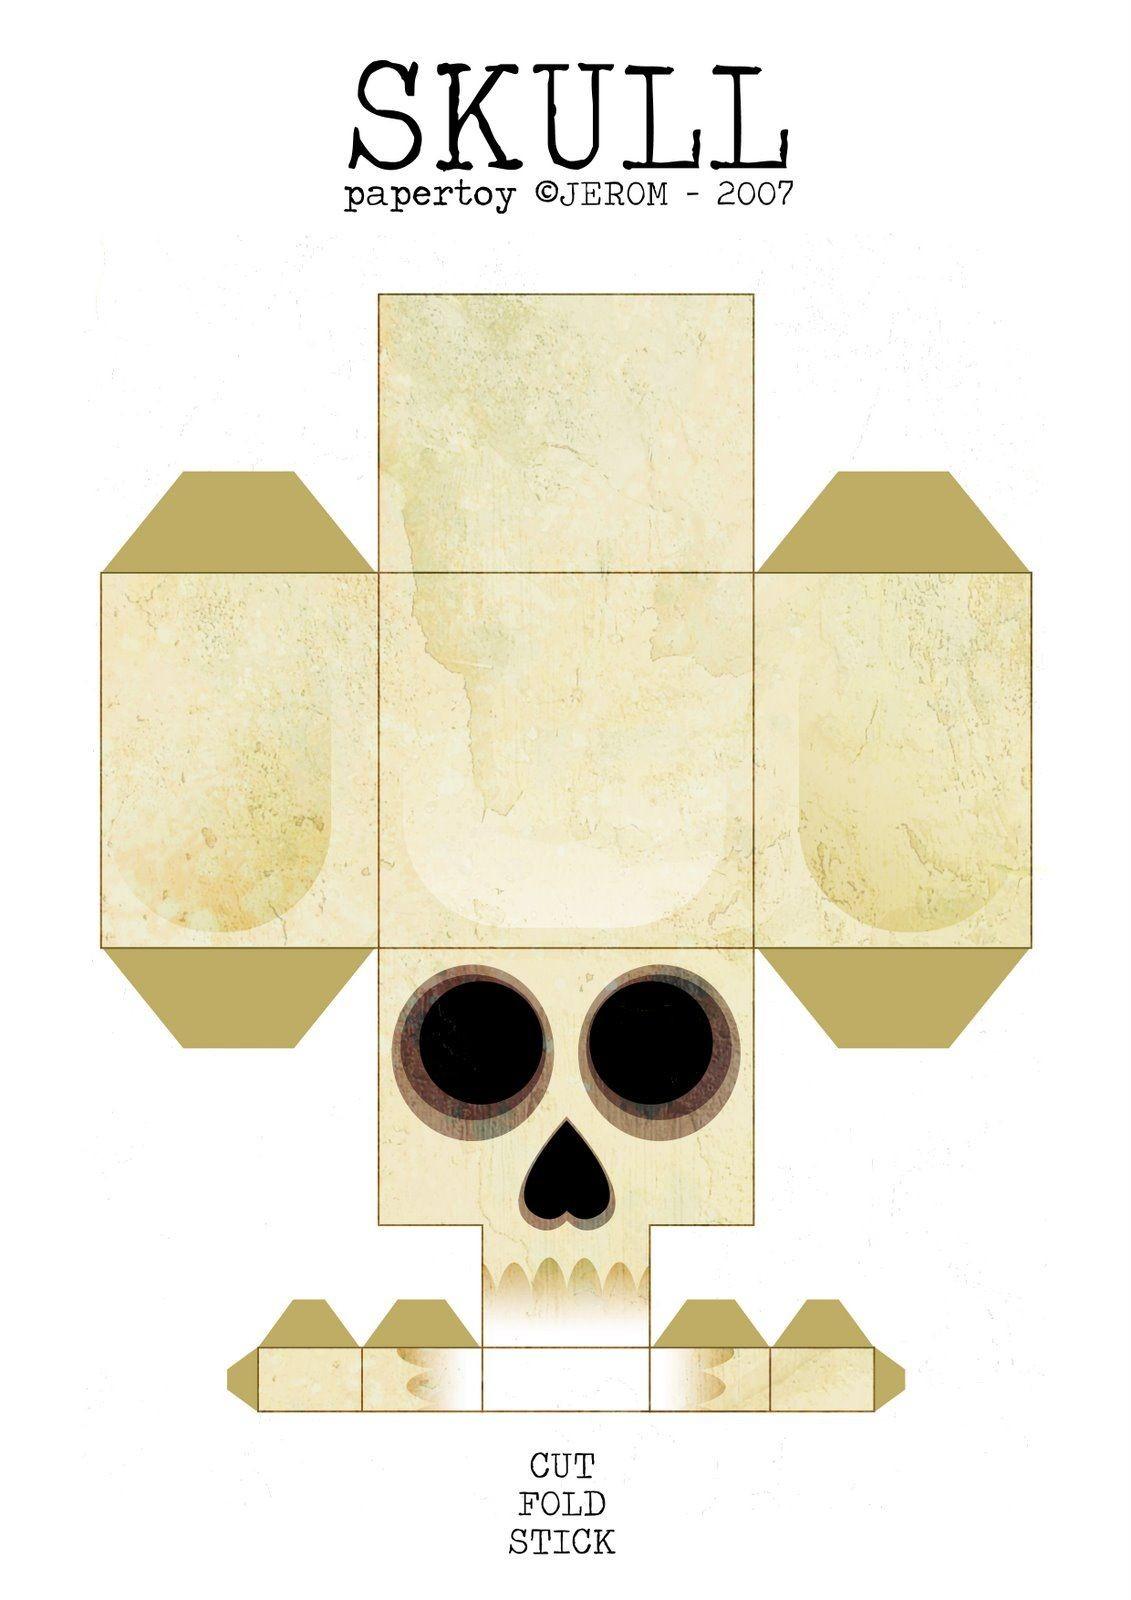 Skeleton Papercraft Jb8ha9cuj44 Tnzz01g0xvi Aaaaaaaaaws 7nkxxe